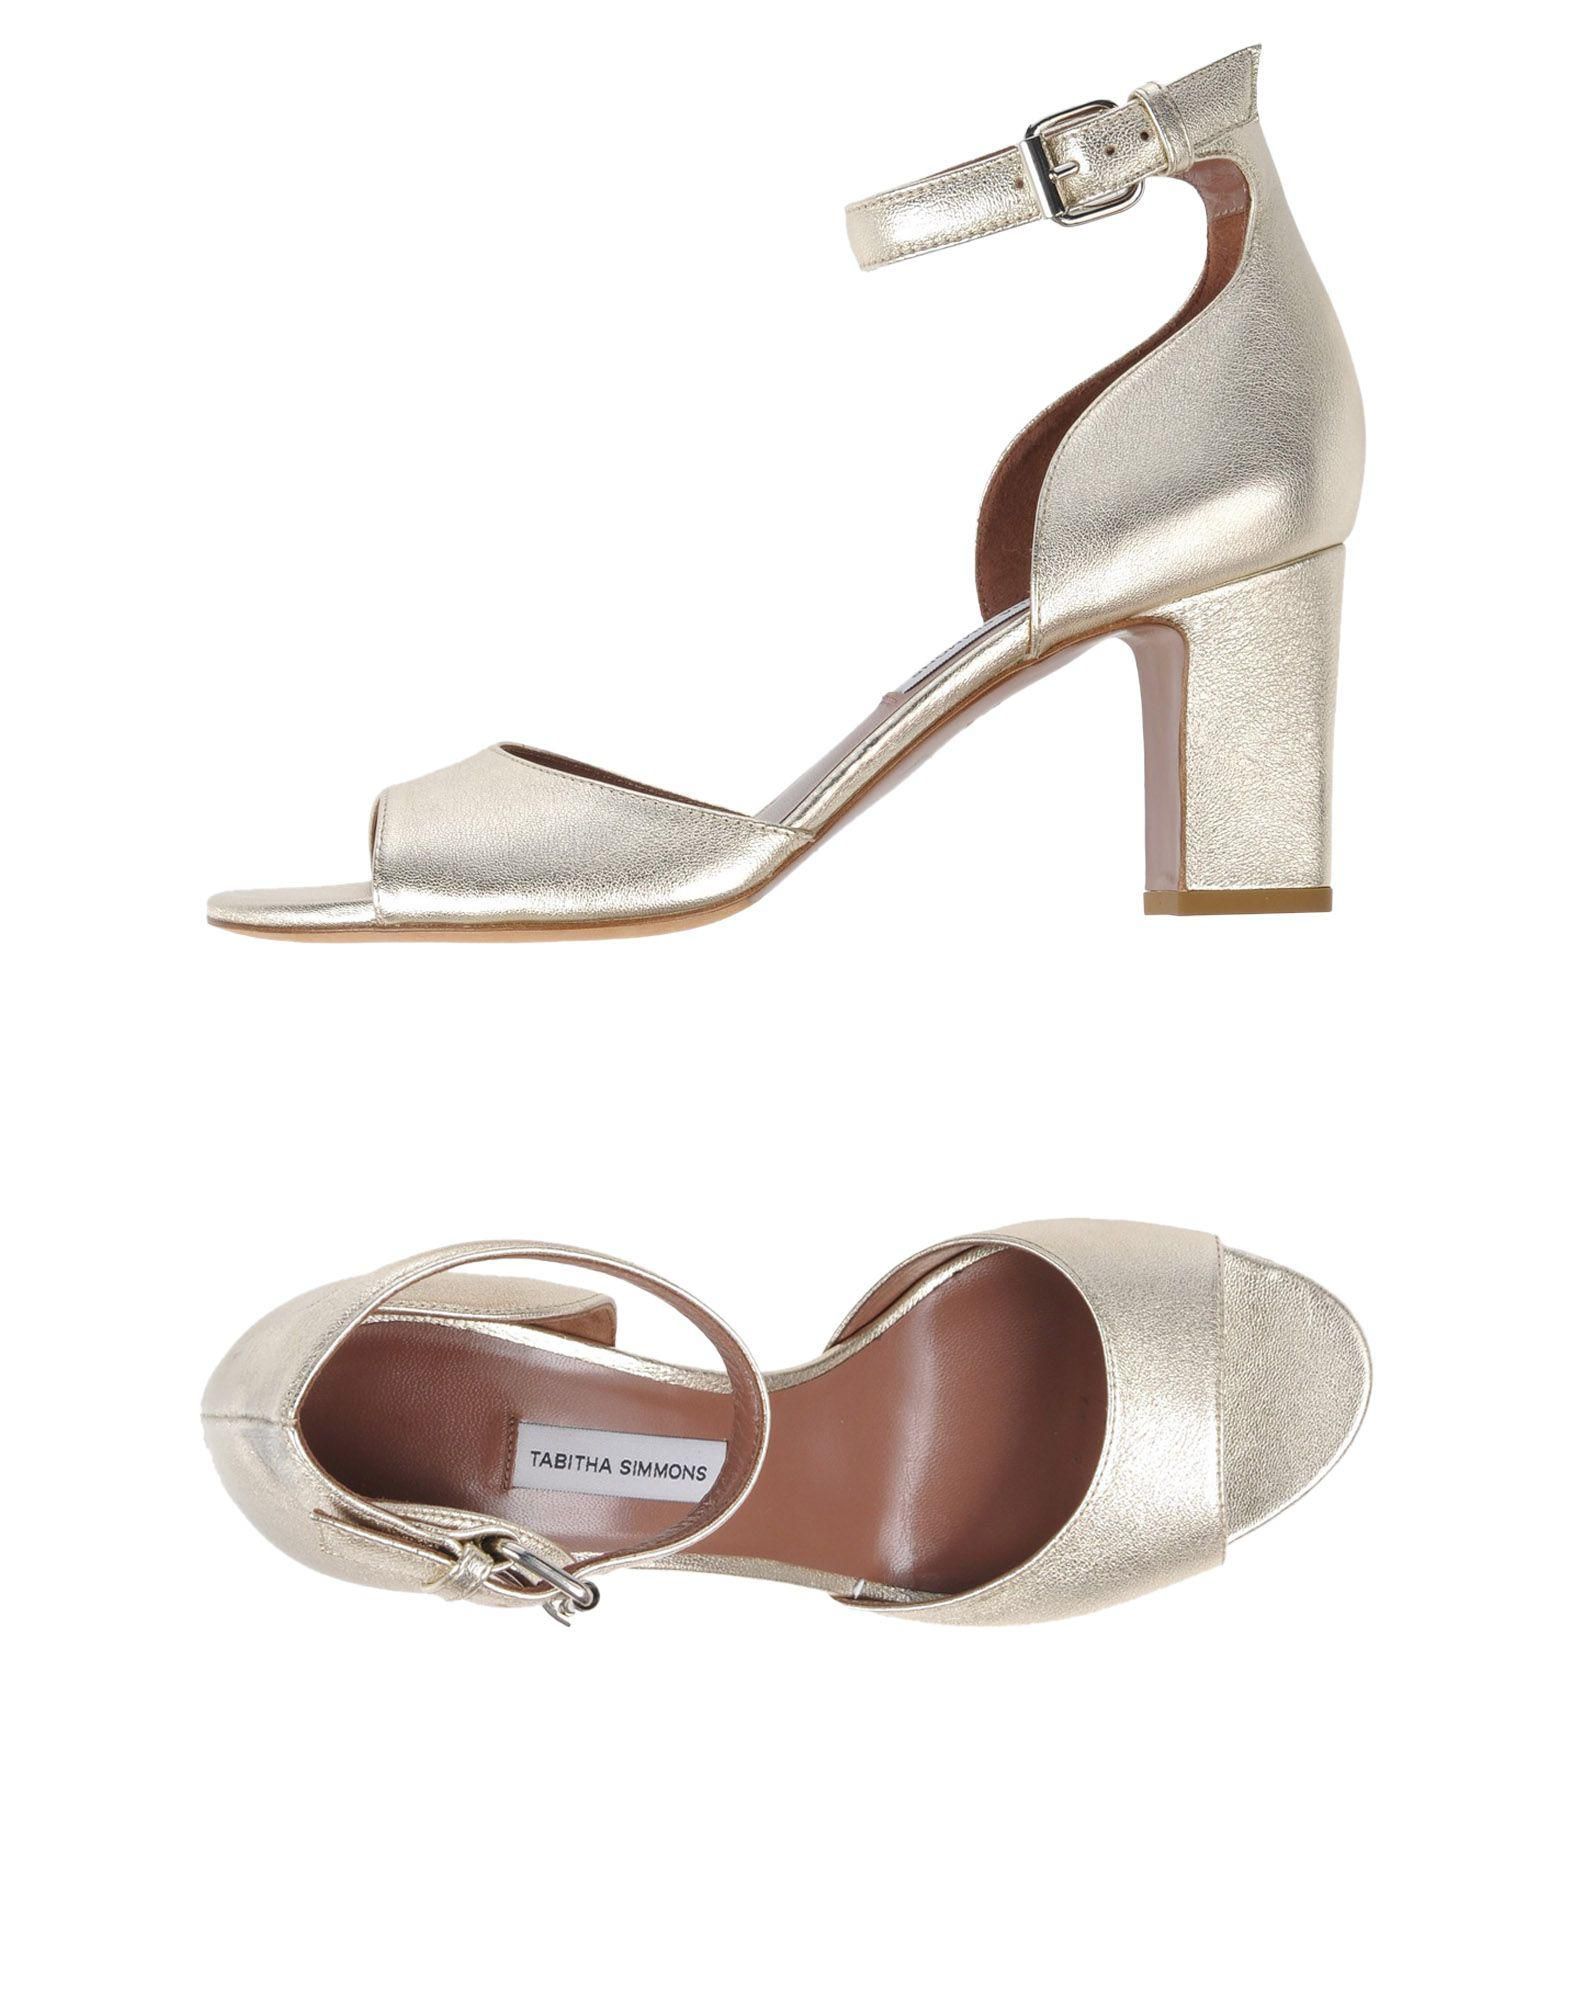 839bb606163 Lyst - Tabitha Simmons Sandals